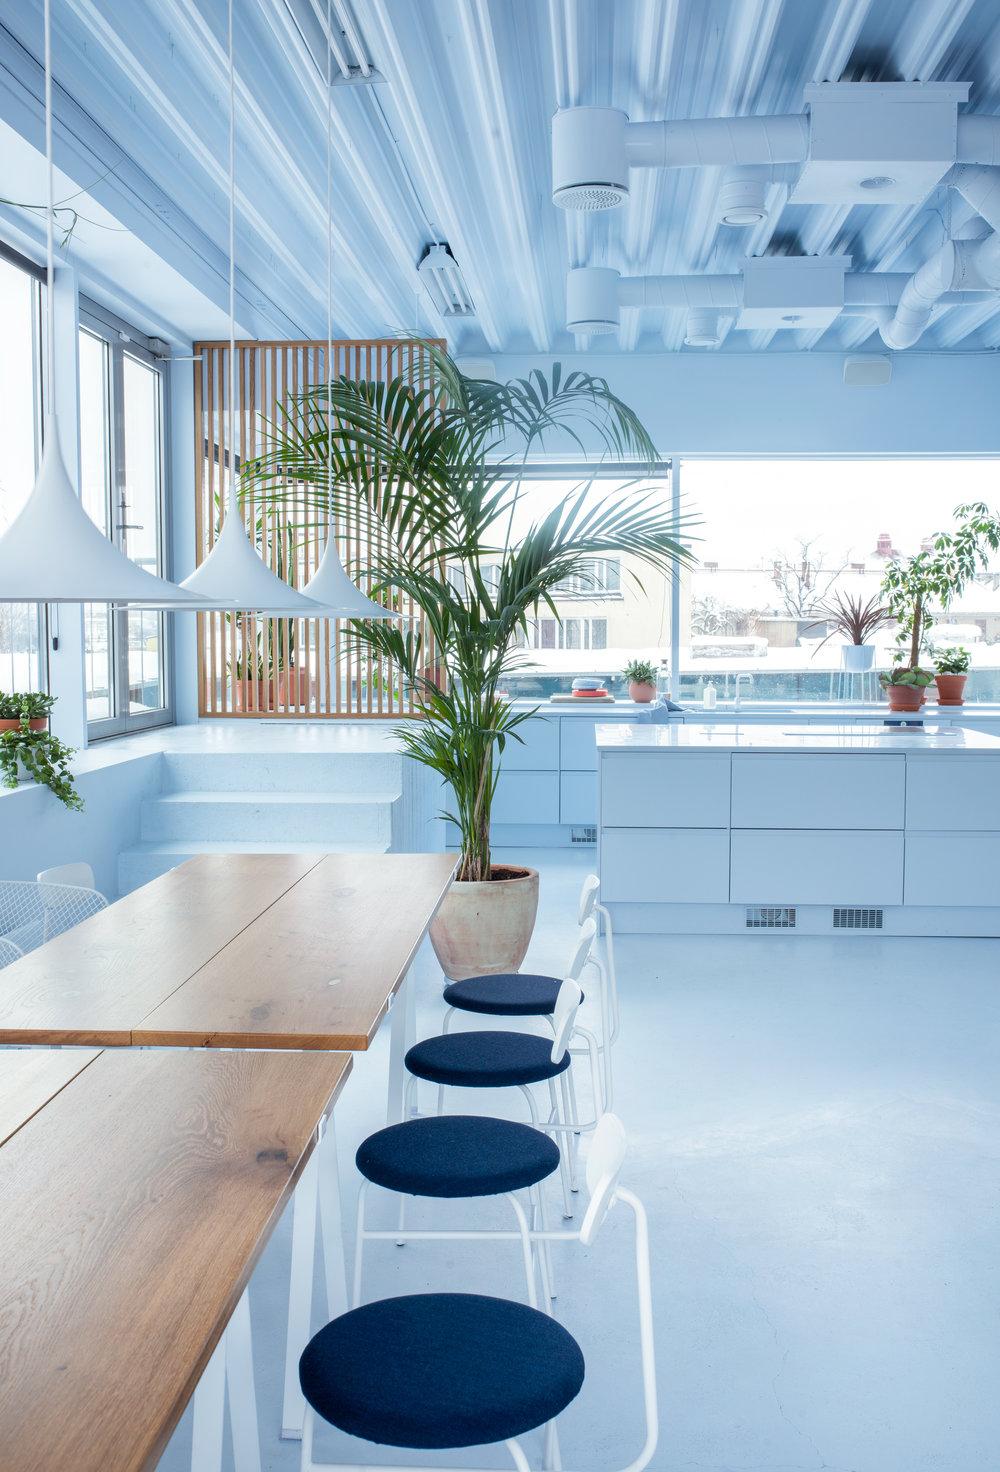 The office kitchen.